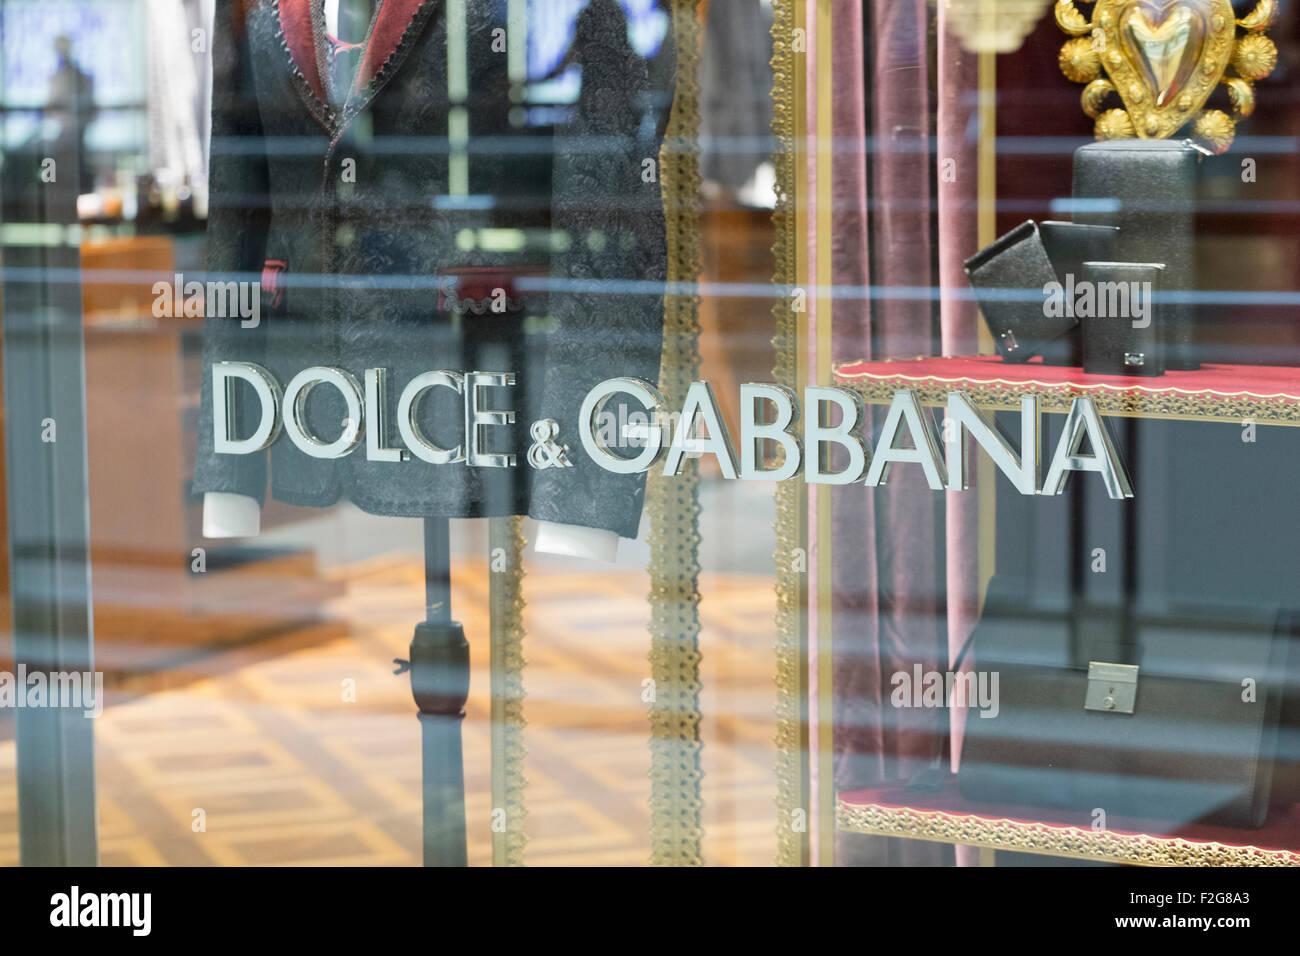 Dolce & Gabbana store - Stock Image